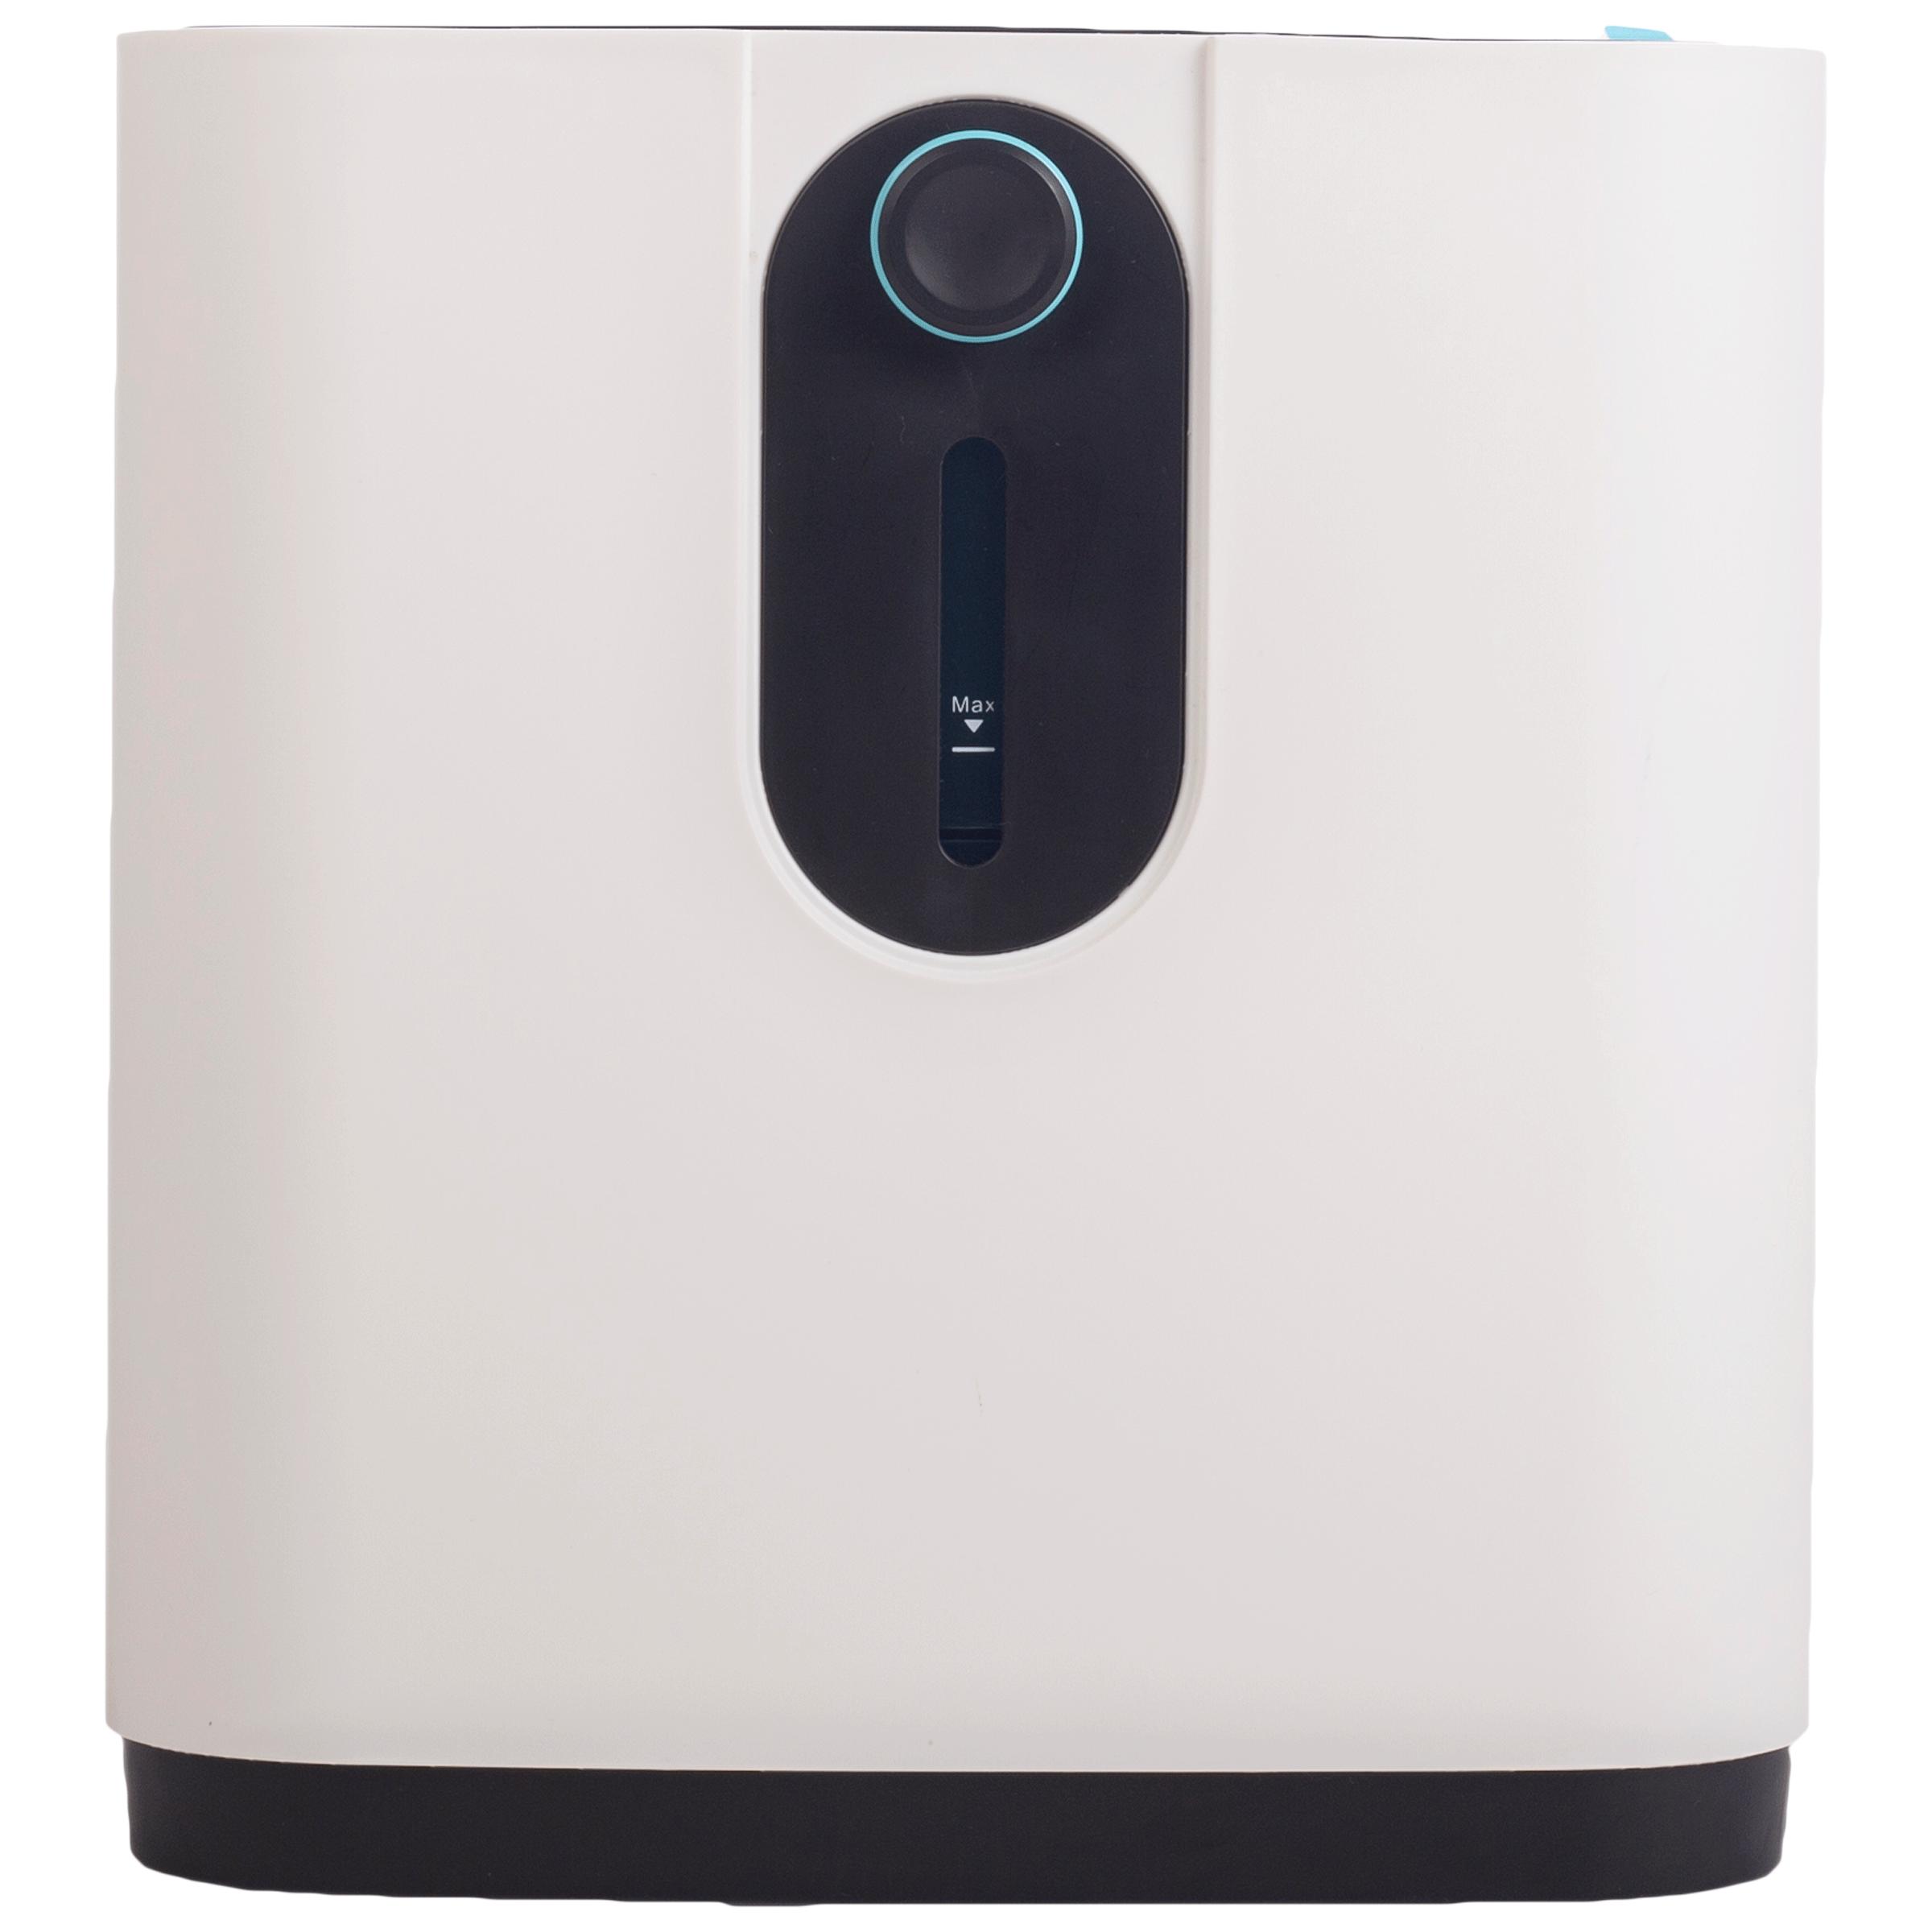 DayPro Tech Household Oxygen Concentrator (Flow Rate: 1L/min, Oxygen Purity 93% + - 3%, ZY-1Z, White)_1